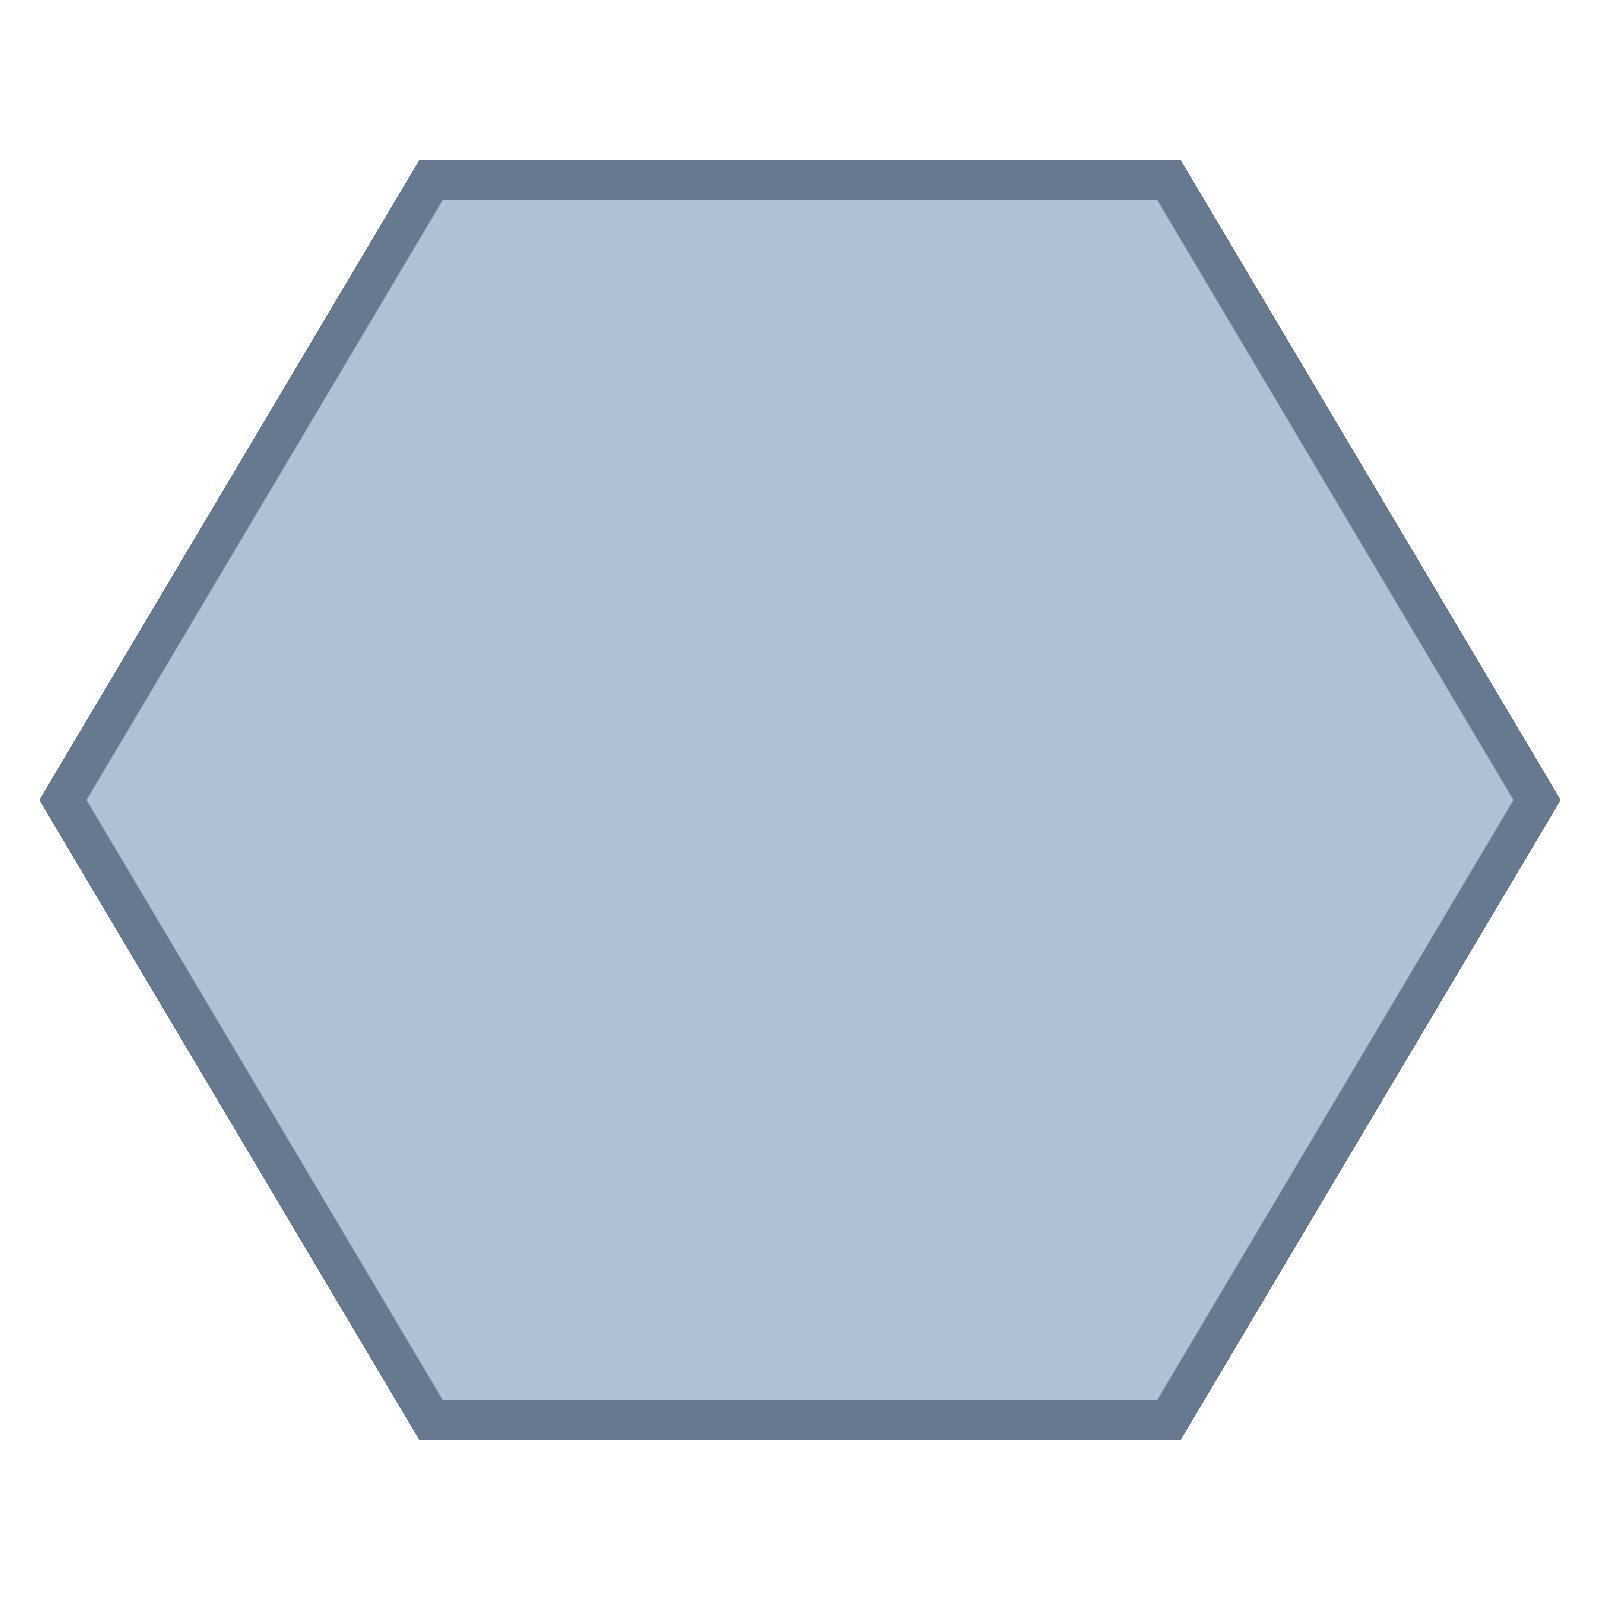 Hexagon Icon - Hexagon Shape, Transparent background PNG HD thumbnail